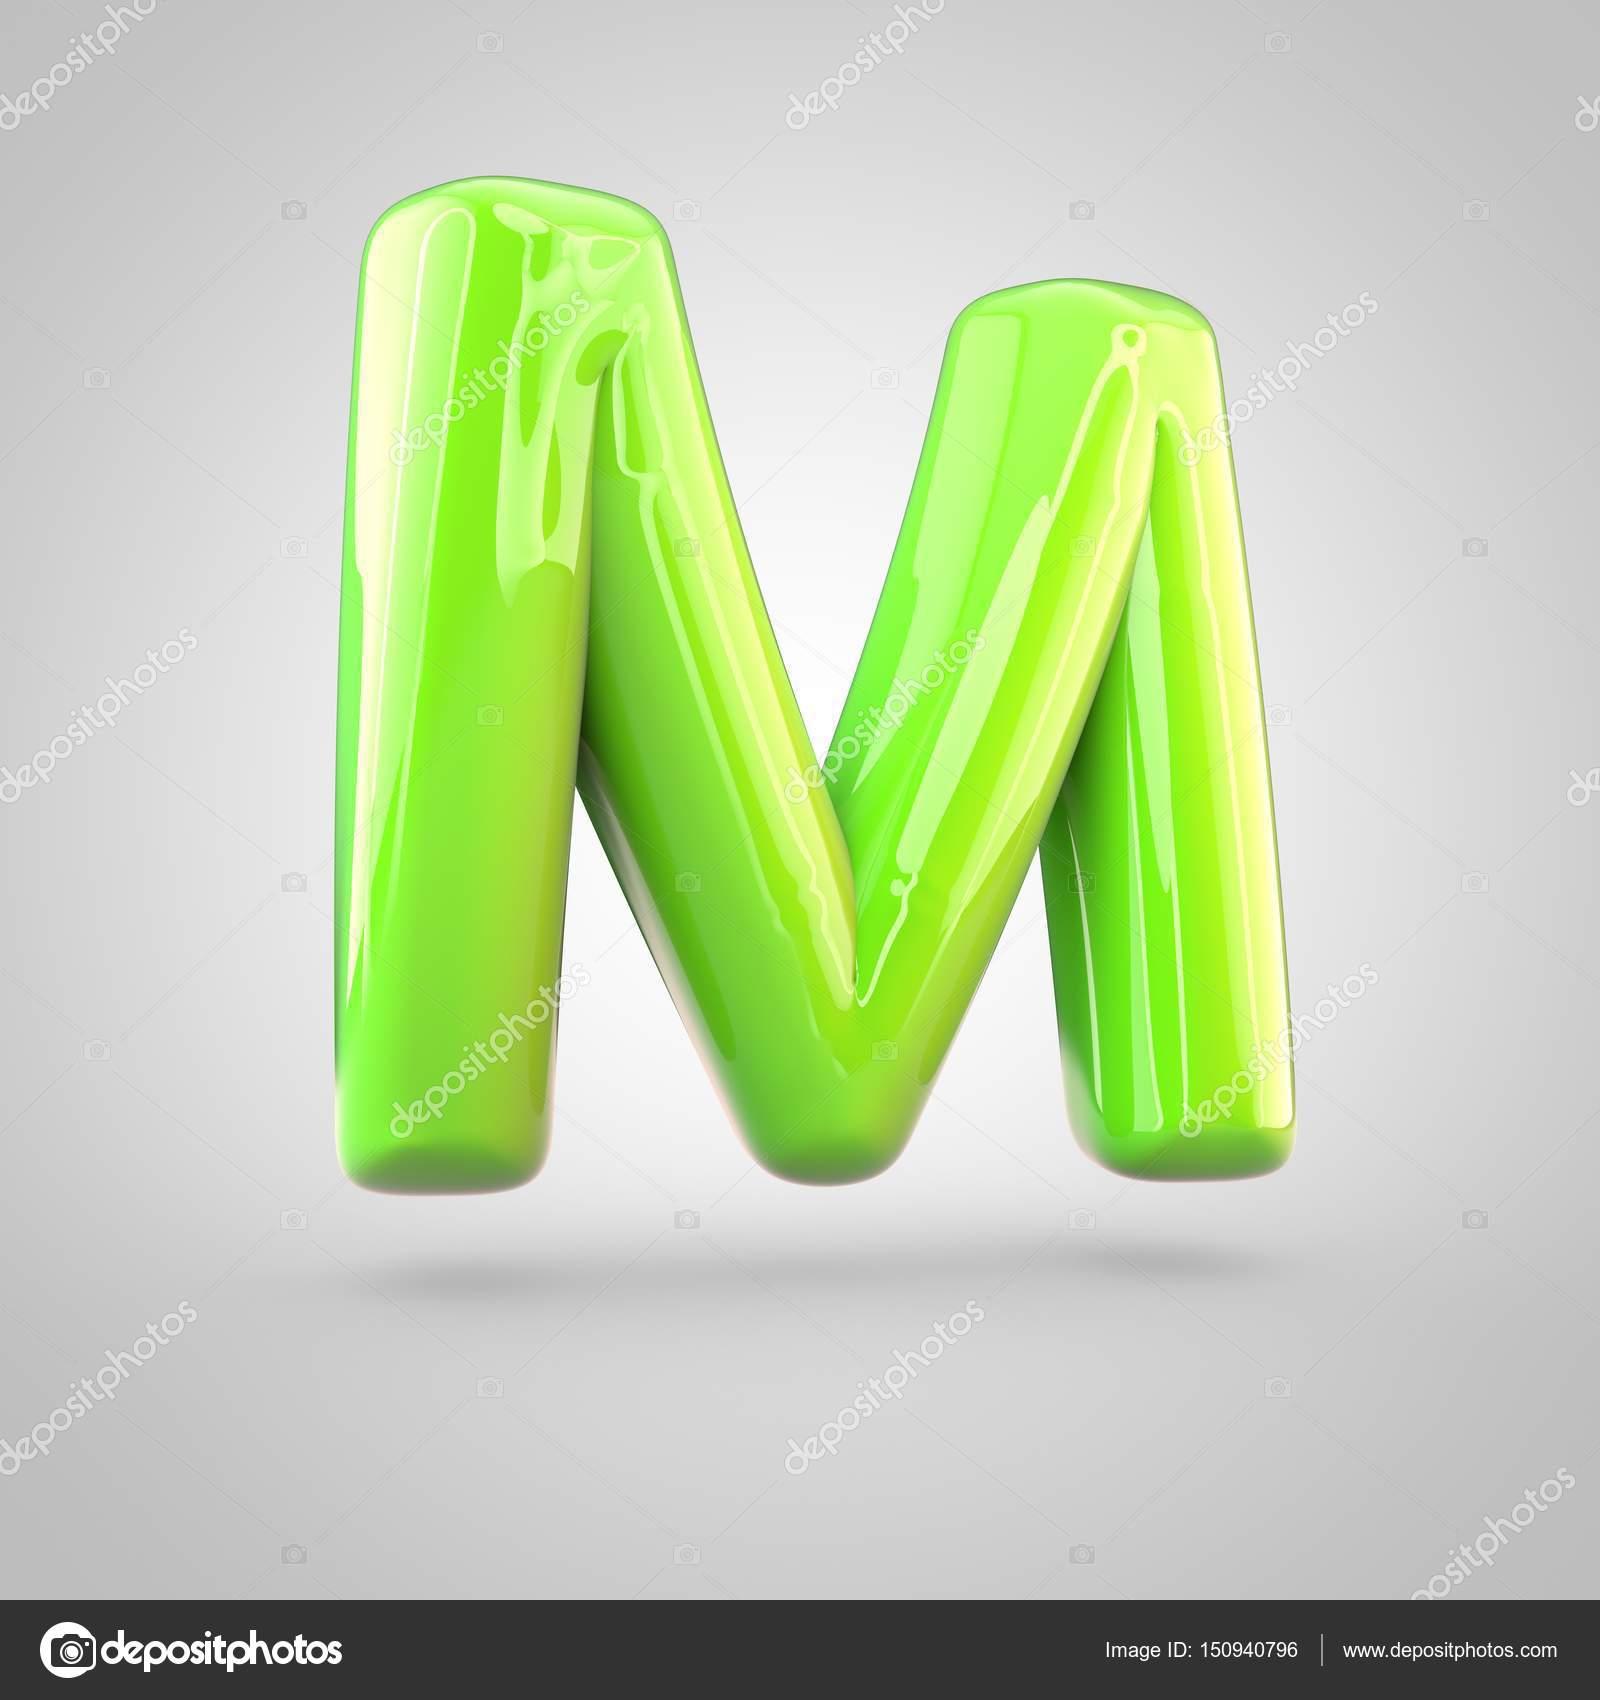 Glossy Paint Alphabet Letter M Stock Photo C Whitebarbie 150940796